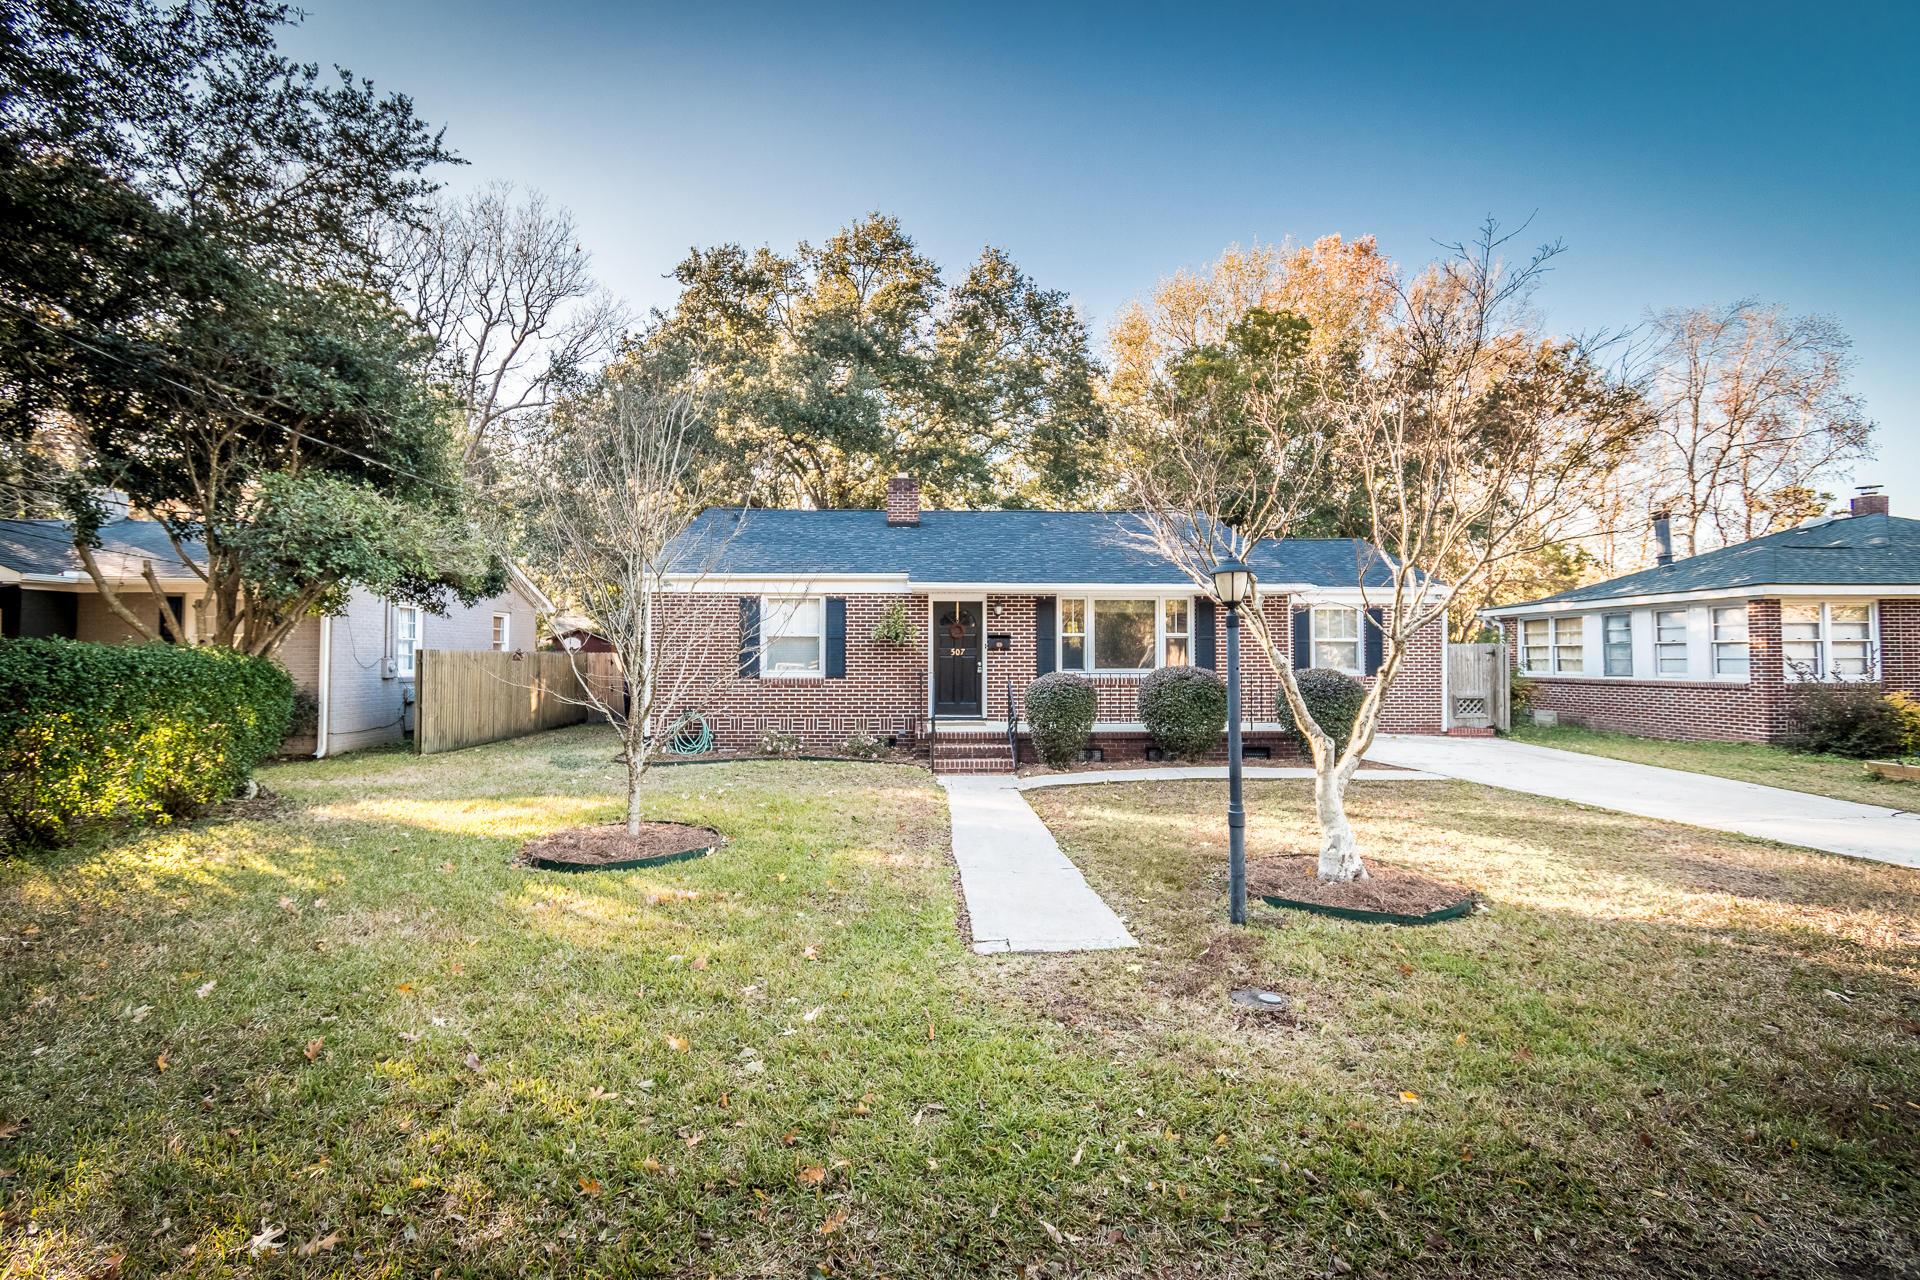 Edgewood Gardens Homes For Sale - 507 Risher, Charleston, SC - 17